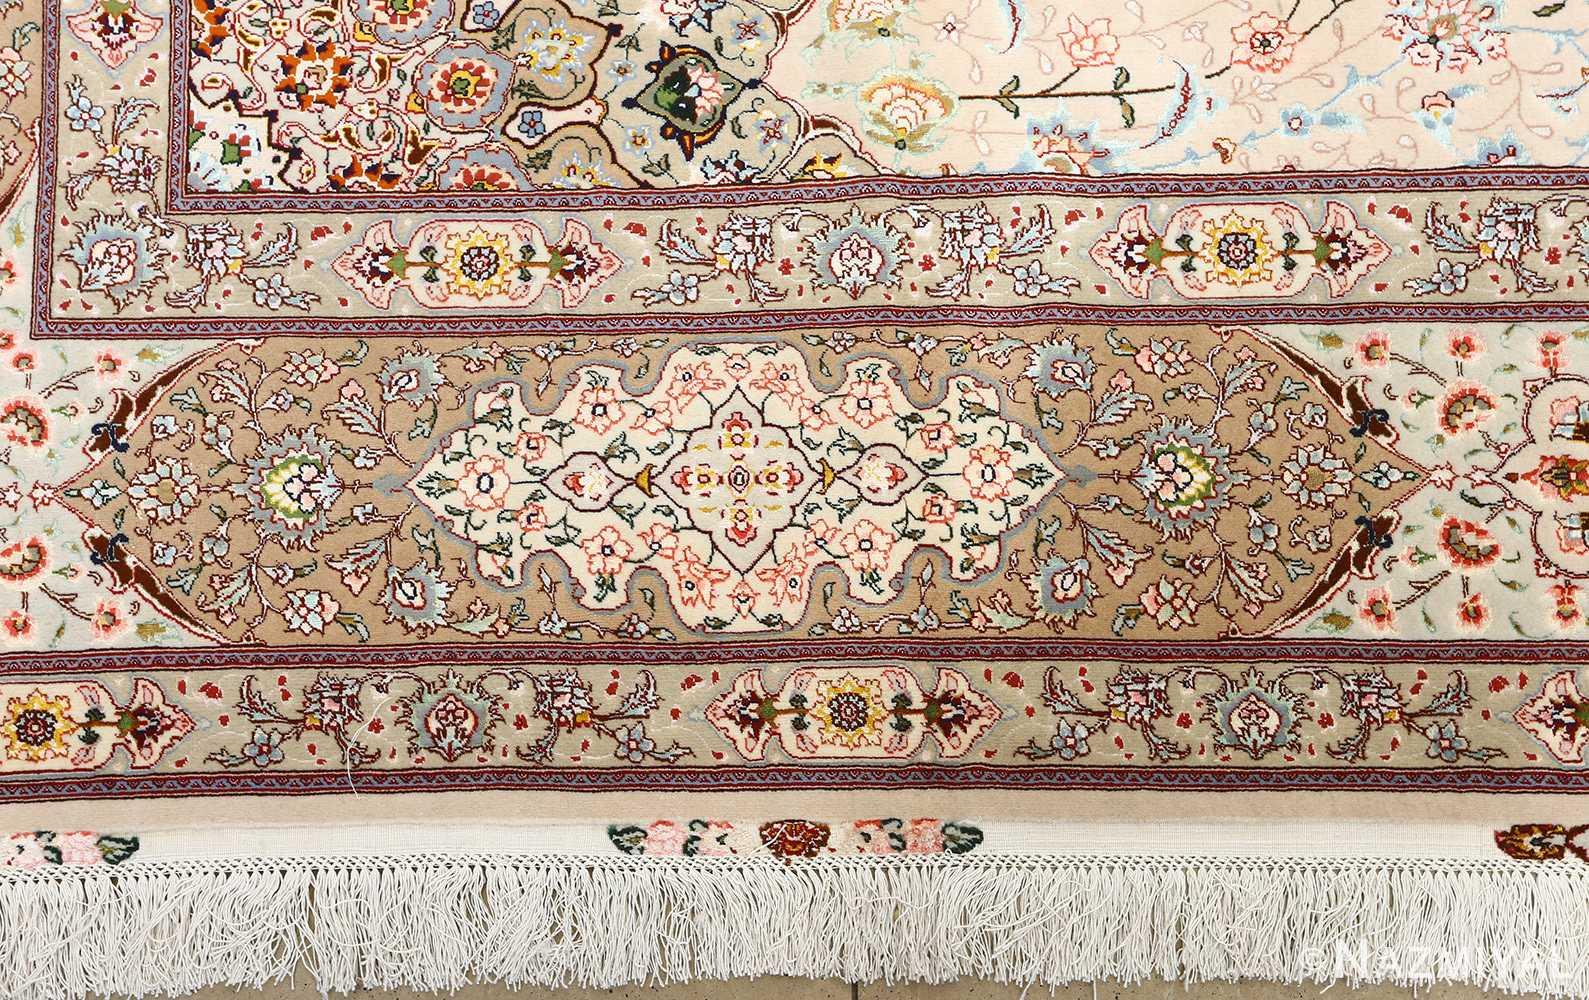 square shahsavarpour design vintage tabriz persian rug 51076 border Nazmiyal